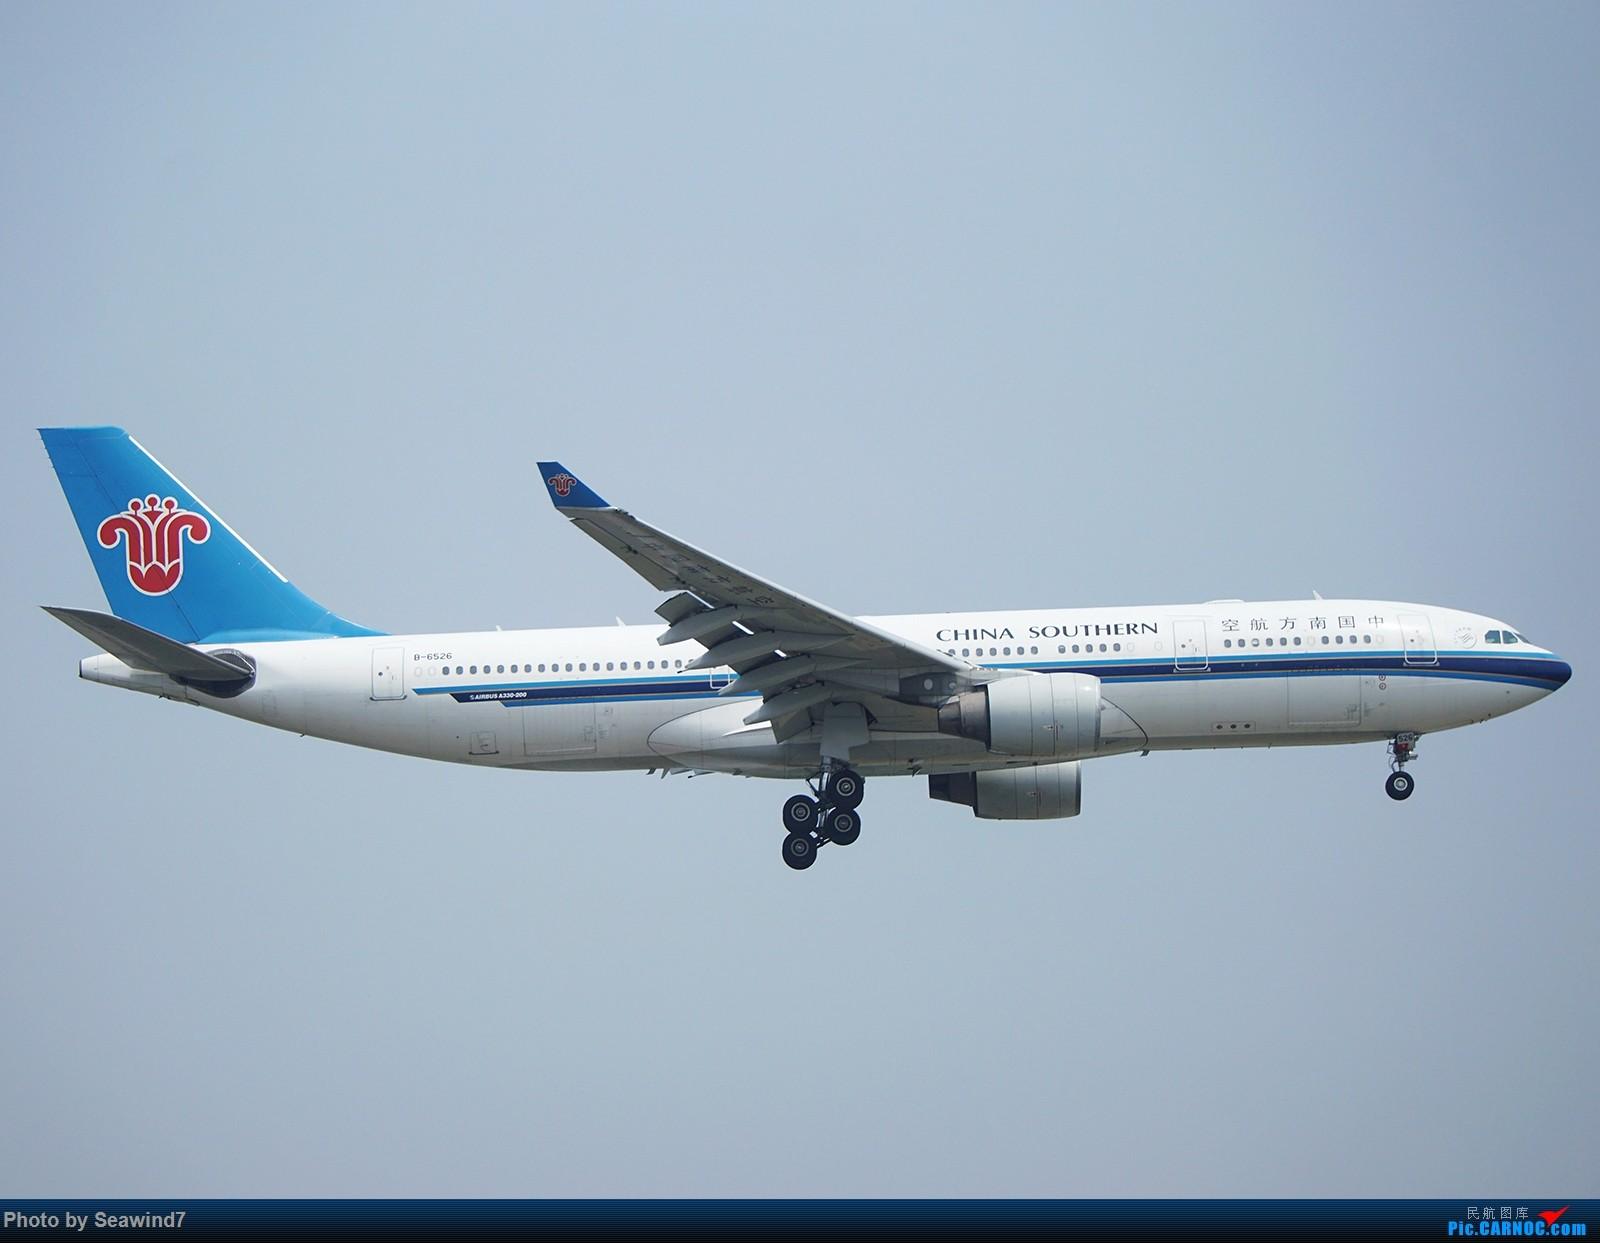 Re:[原创]新手的五一假期(含玩具总动员) AIRBUS A330-200 B-6526 中国上海虹桥国际机场